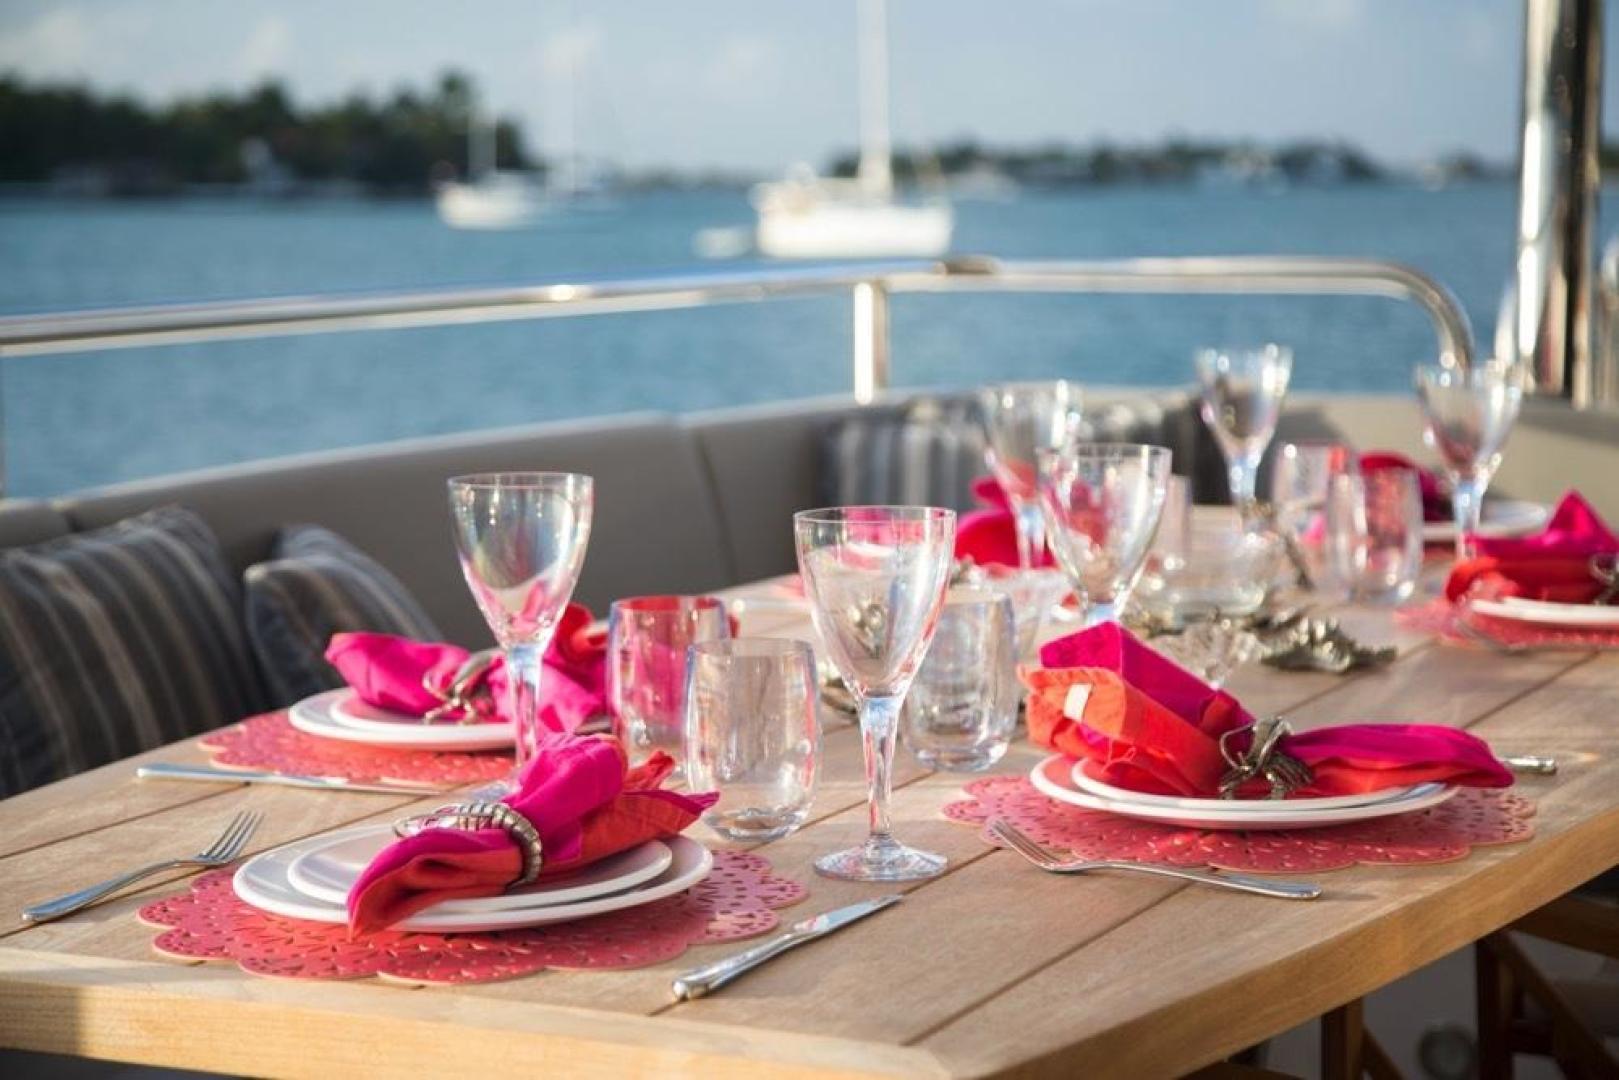 Sunseeker-28 Metre Yacht 2016-RIII Miami-Florida-United States-600090 | Thumbnail